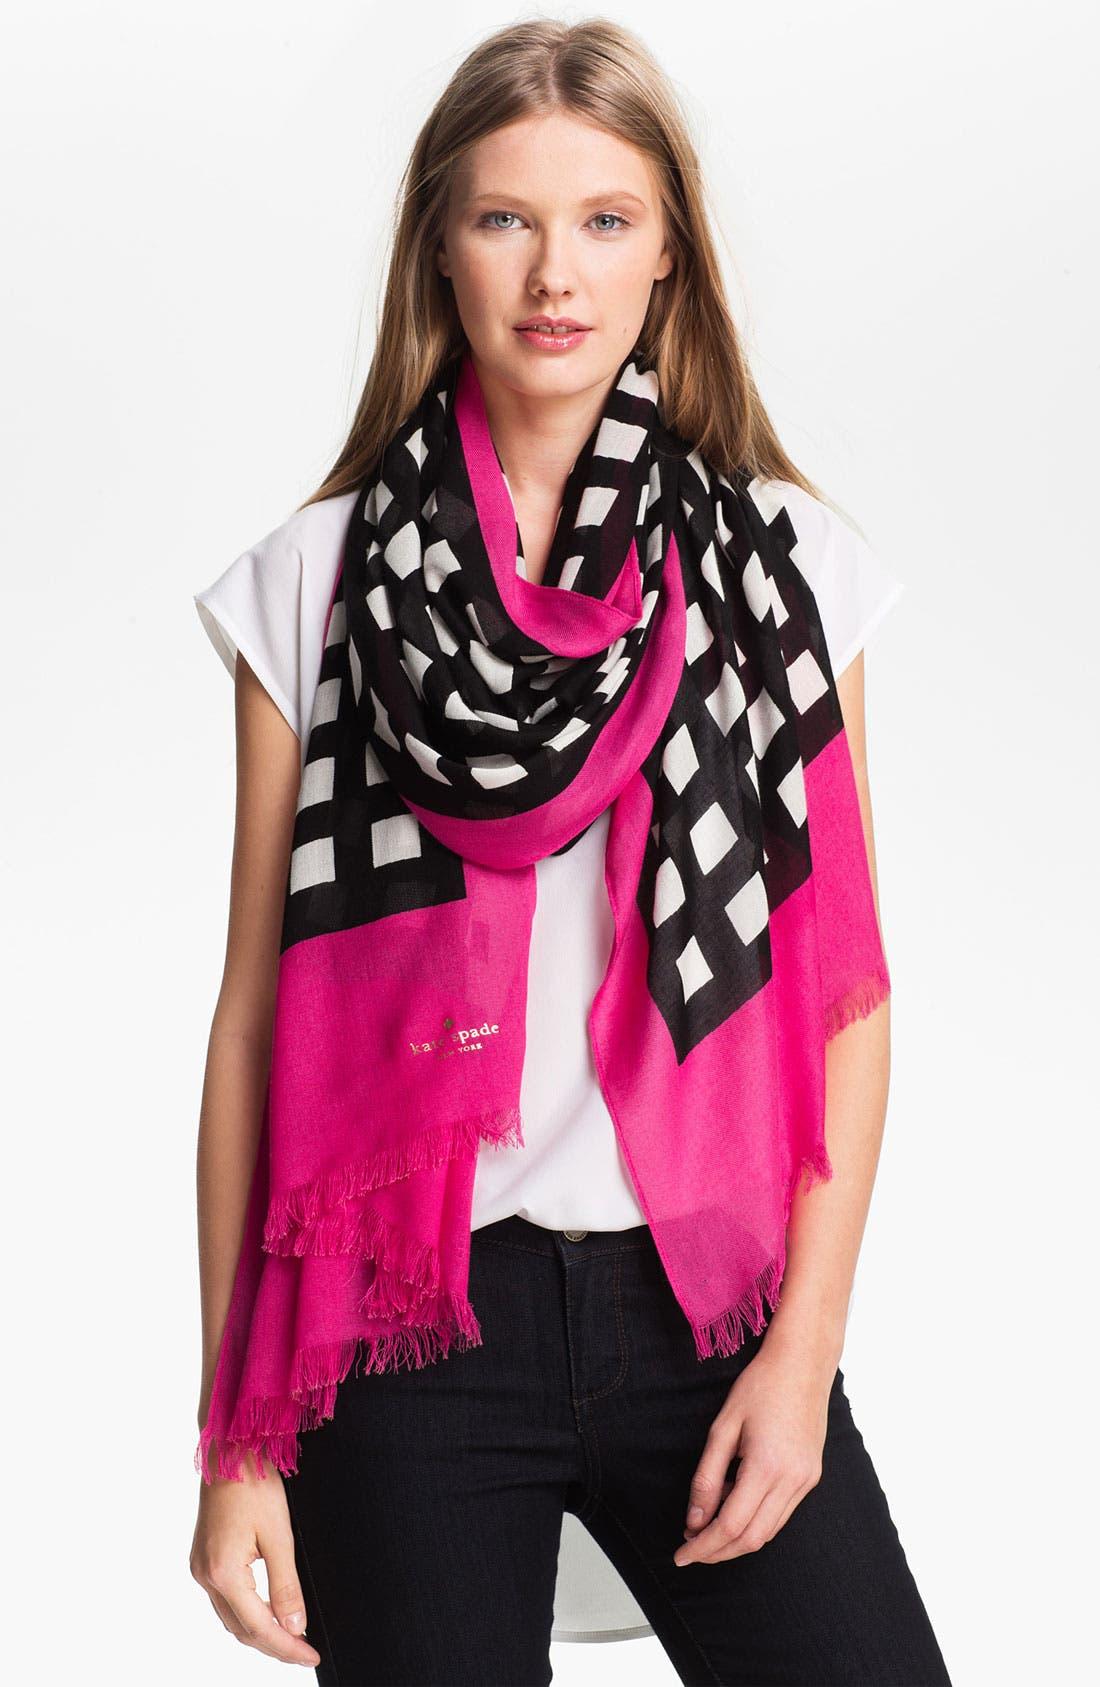 Alternate Image 1 Selected - kate spade new york 'pop art' scarf